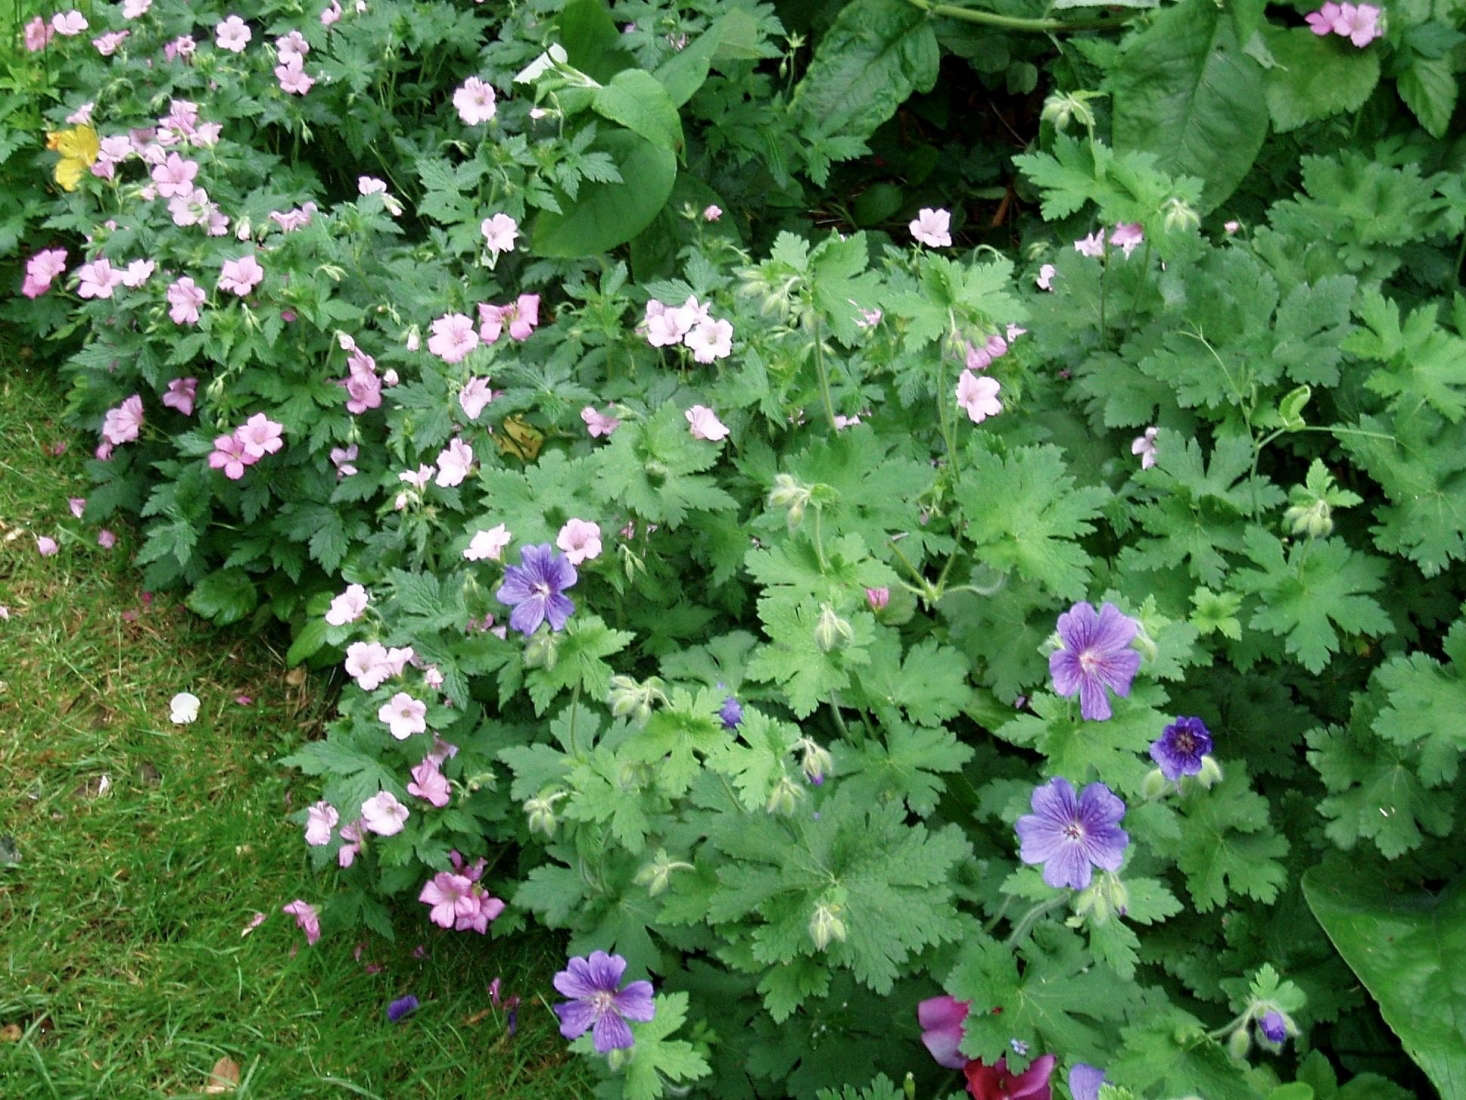 A border of geraniums edges a garden bed. Photograph by Amanda Slater via Flickr.